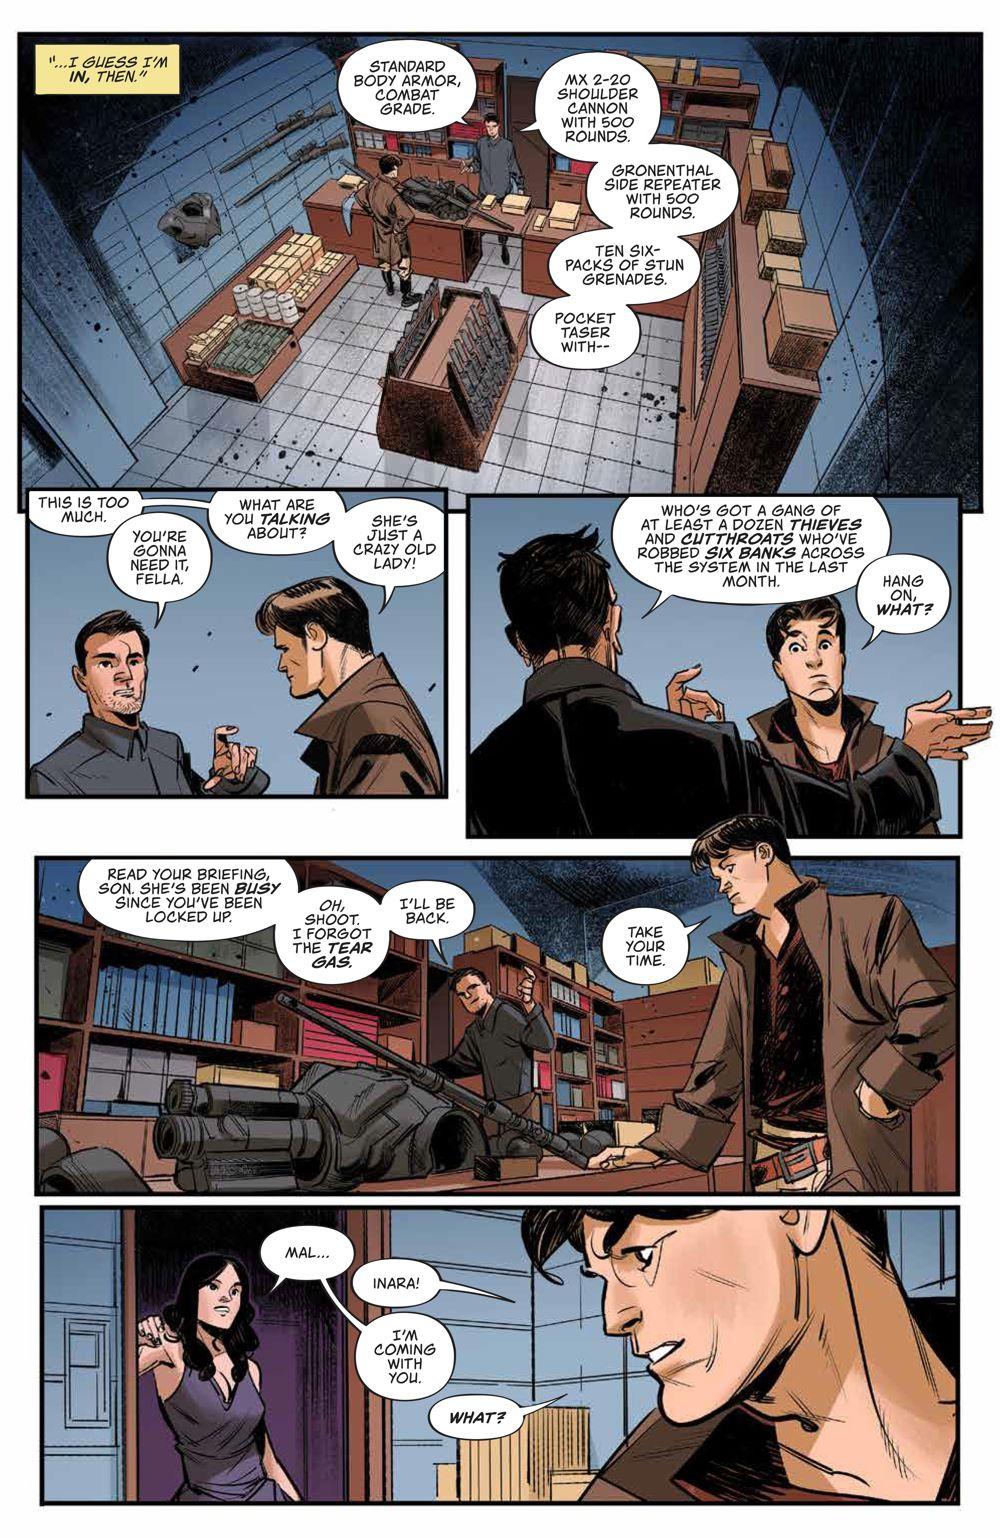 Firefly_NewSheriffVerse_v1_HC_PRESS_15 ComicList Previews: FIREFLY NEW SHERIFF IN THE 'VERSE VOLUME 1 HC